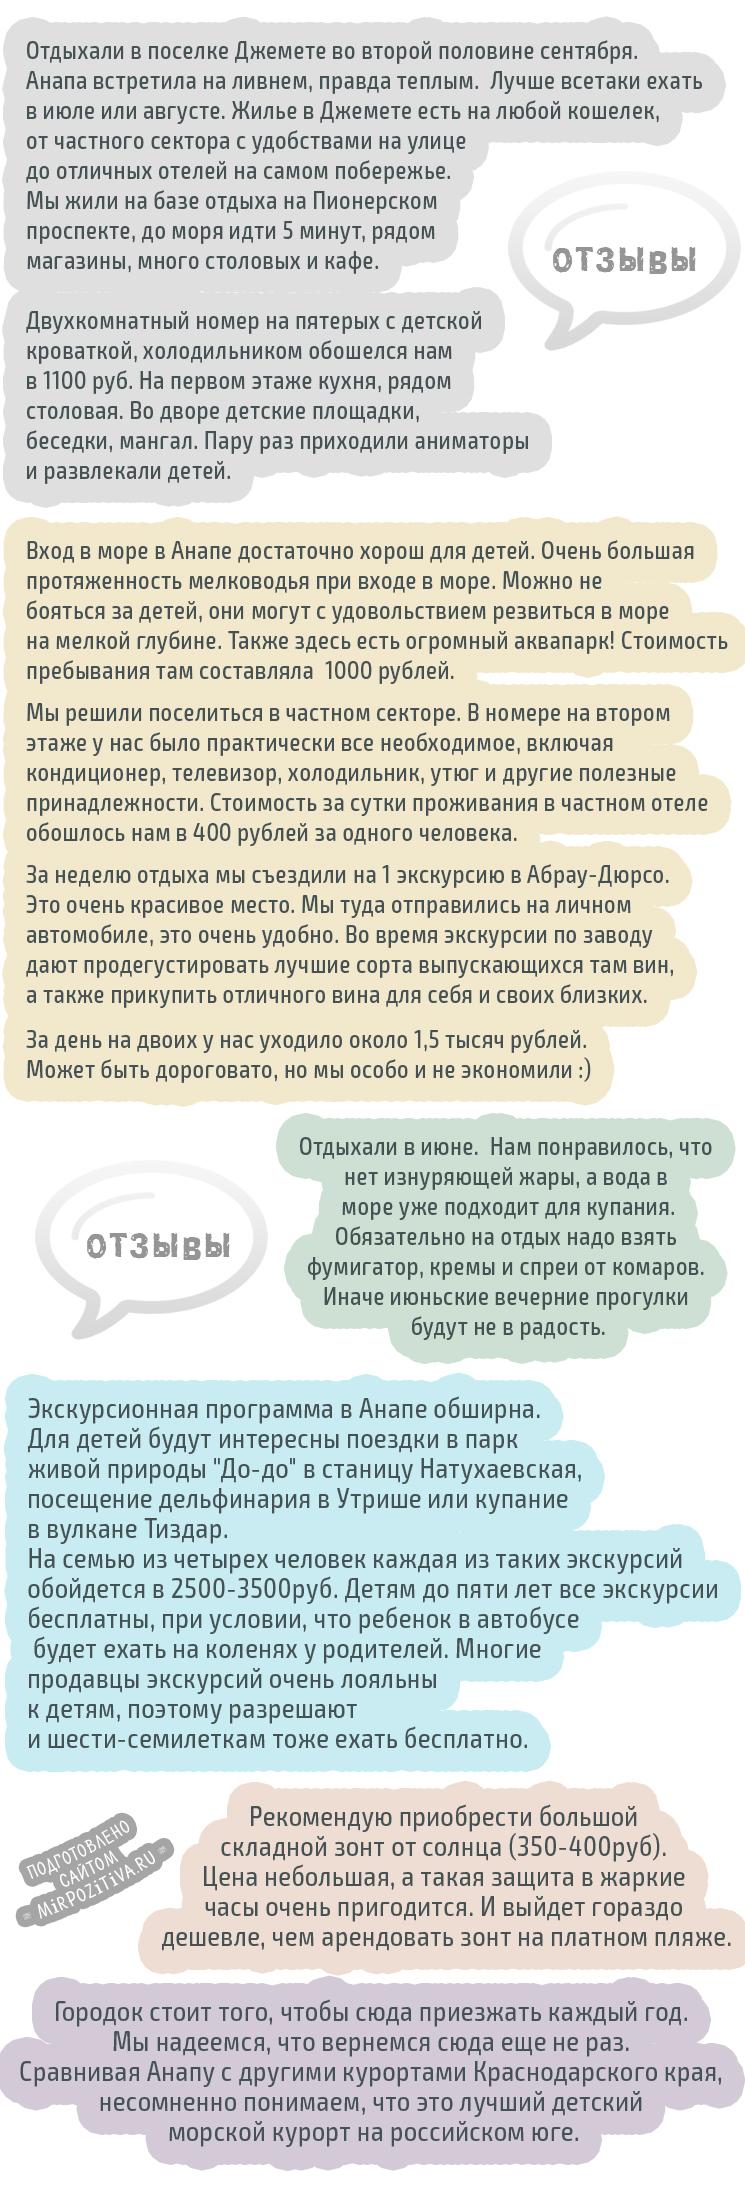 отзывы об Анапе